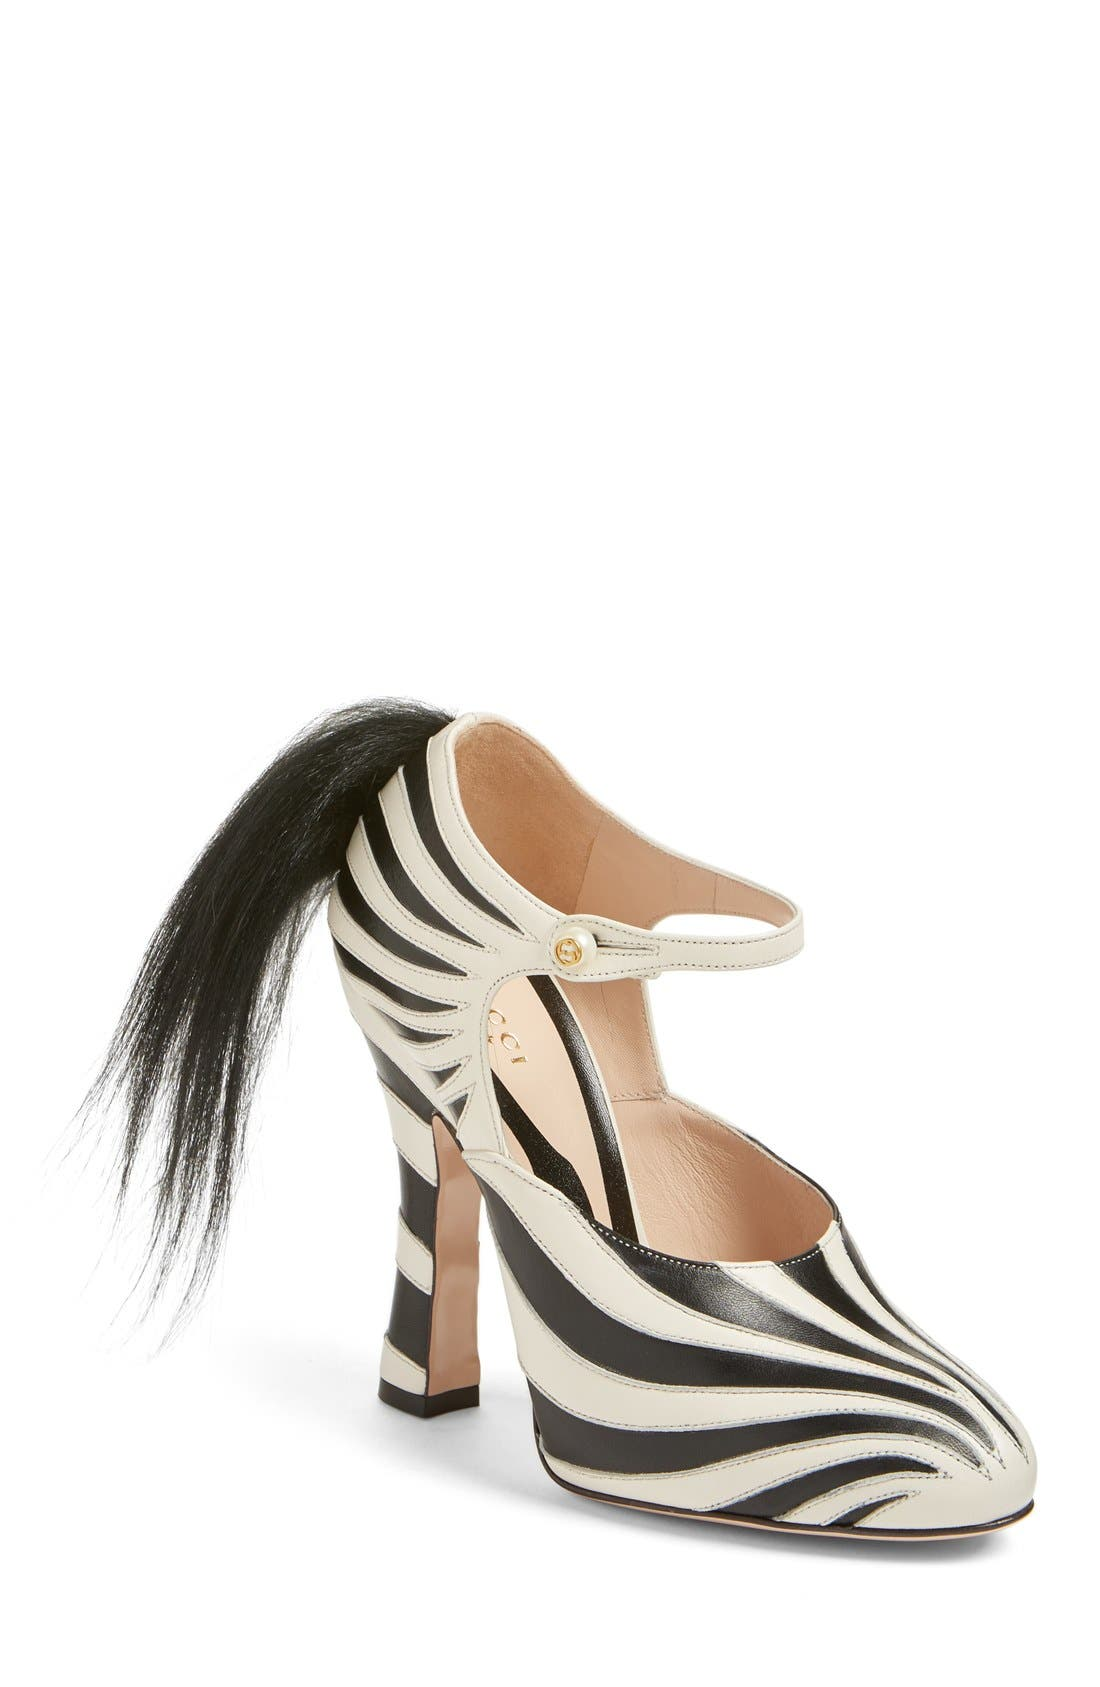 Alternate Image 1 Selected - Gucci 'Lesley' Zebra Stripe Pump (Women)